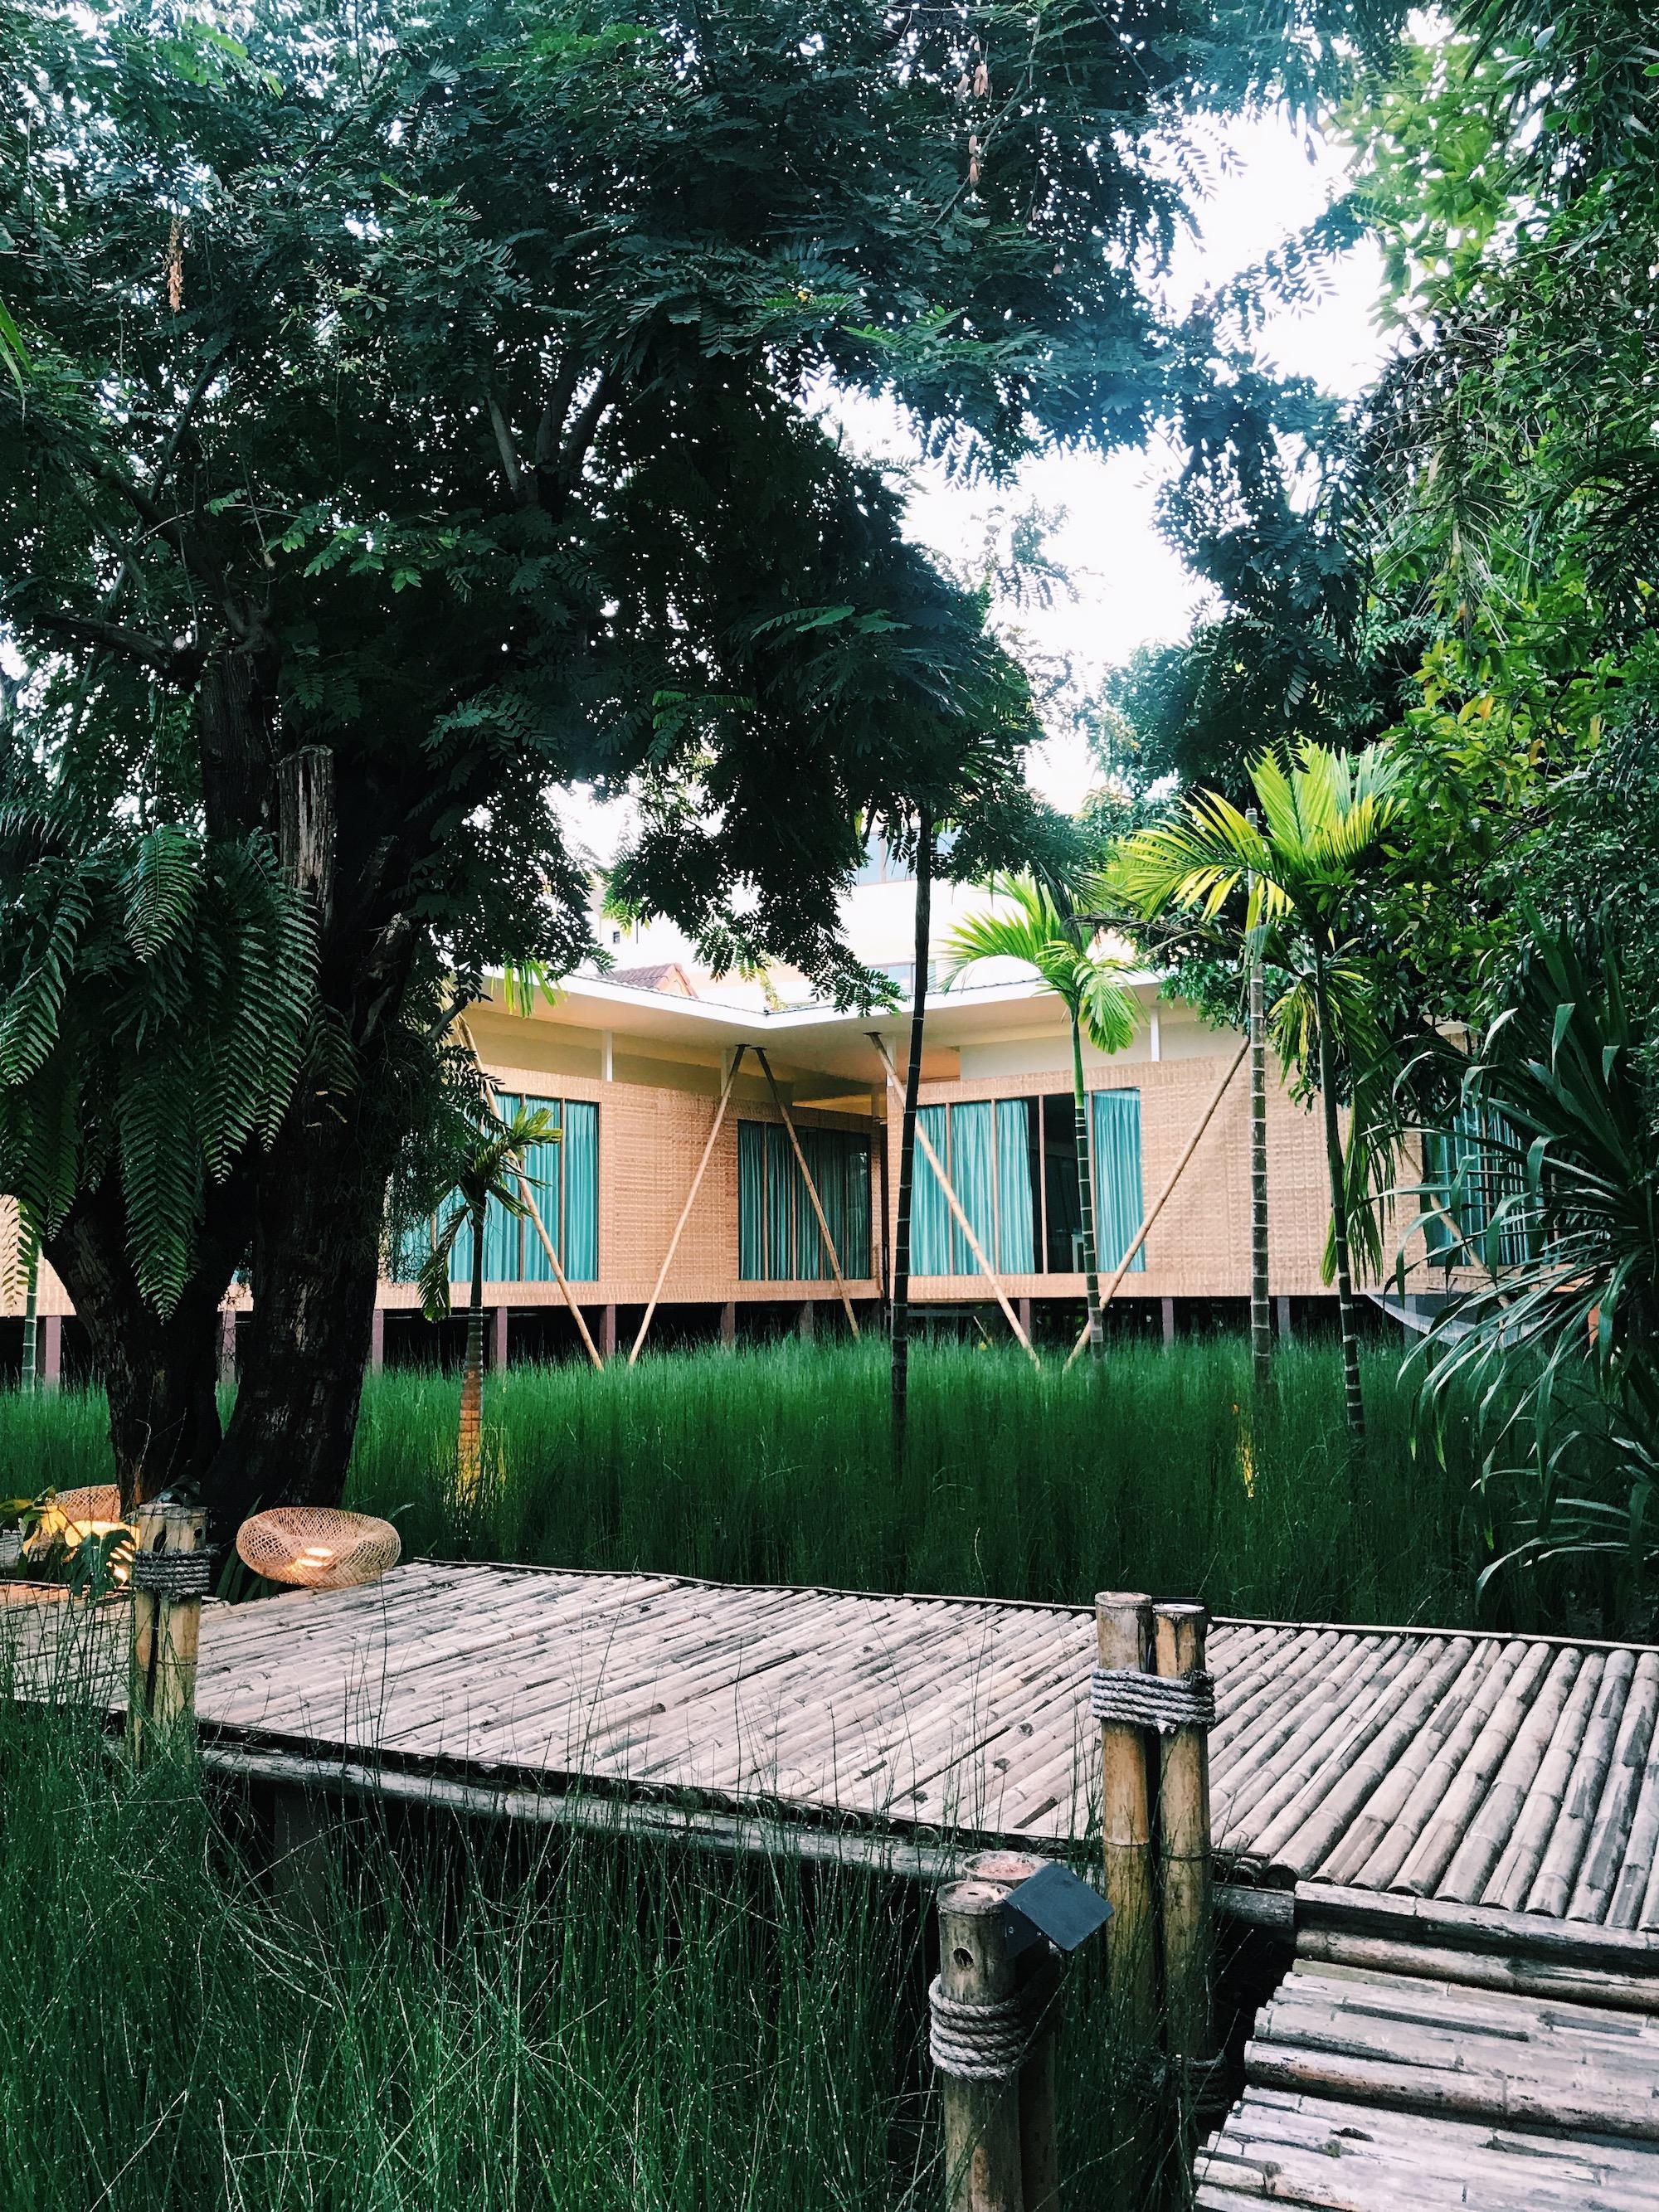 Chiang Mai Thailand Travel Guide - Claire Eliza - Sense Garden Massage.JPG